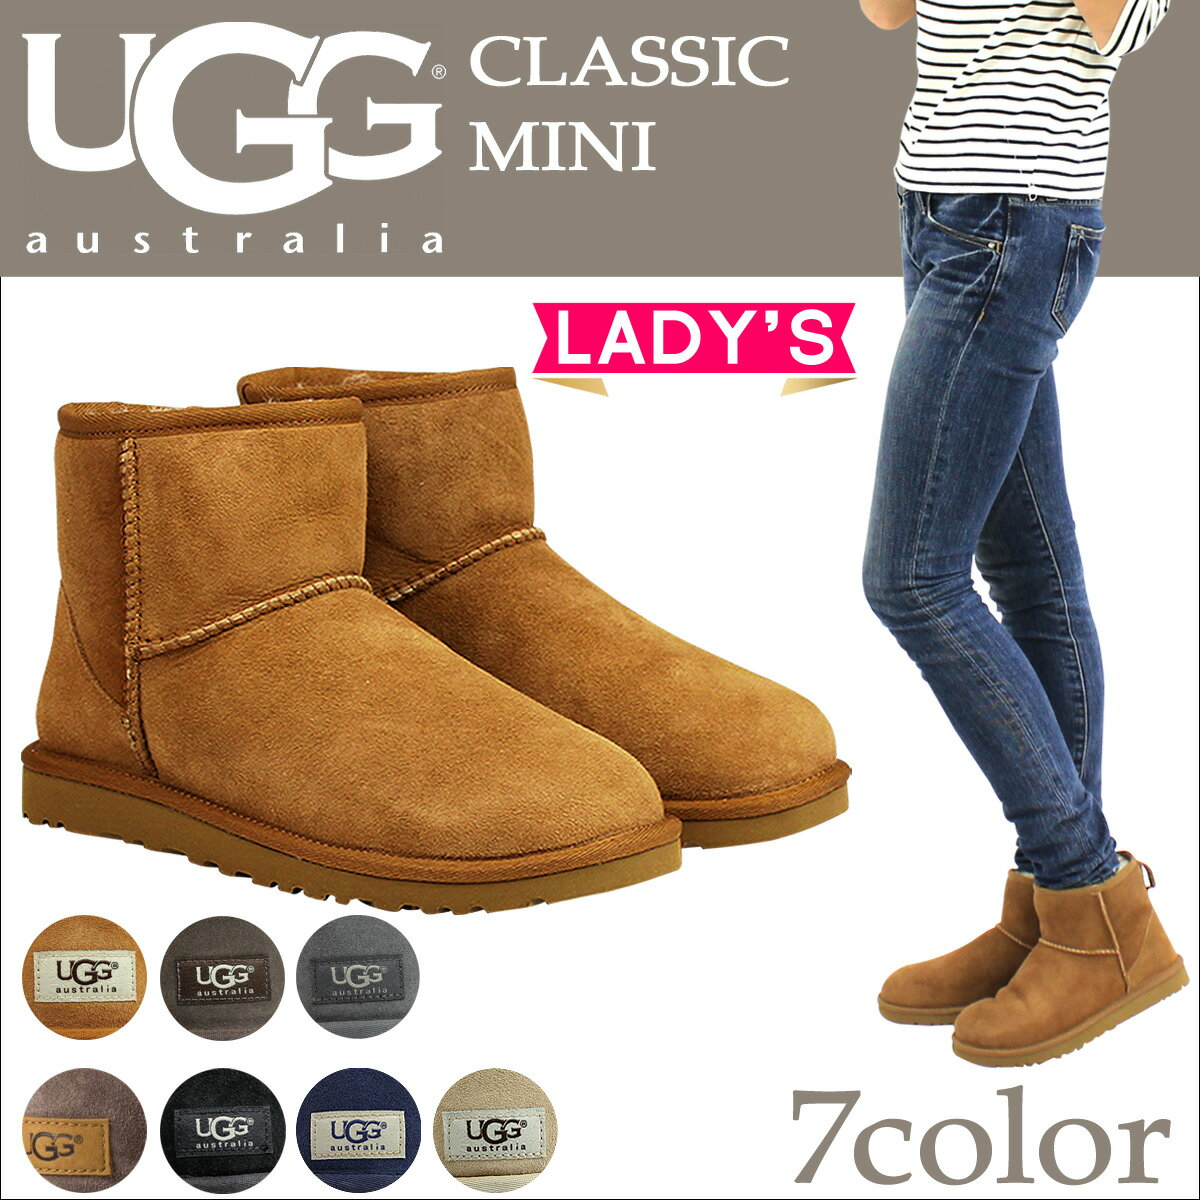 UGG WOMENS CLASSIC MINI II アグ ムートン ブーツ クラシック ミニ 2 5854 1016222 レディース [181]